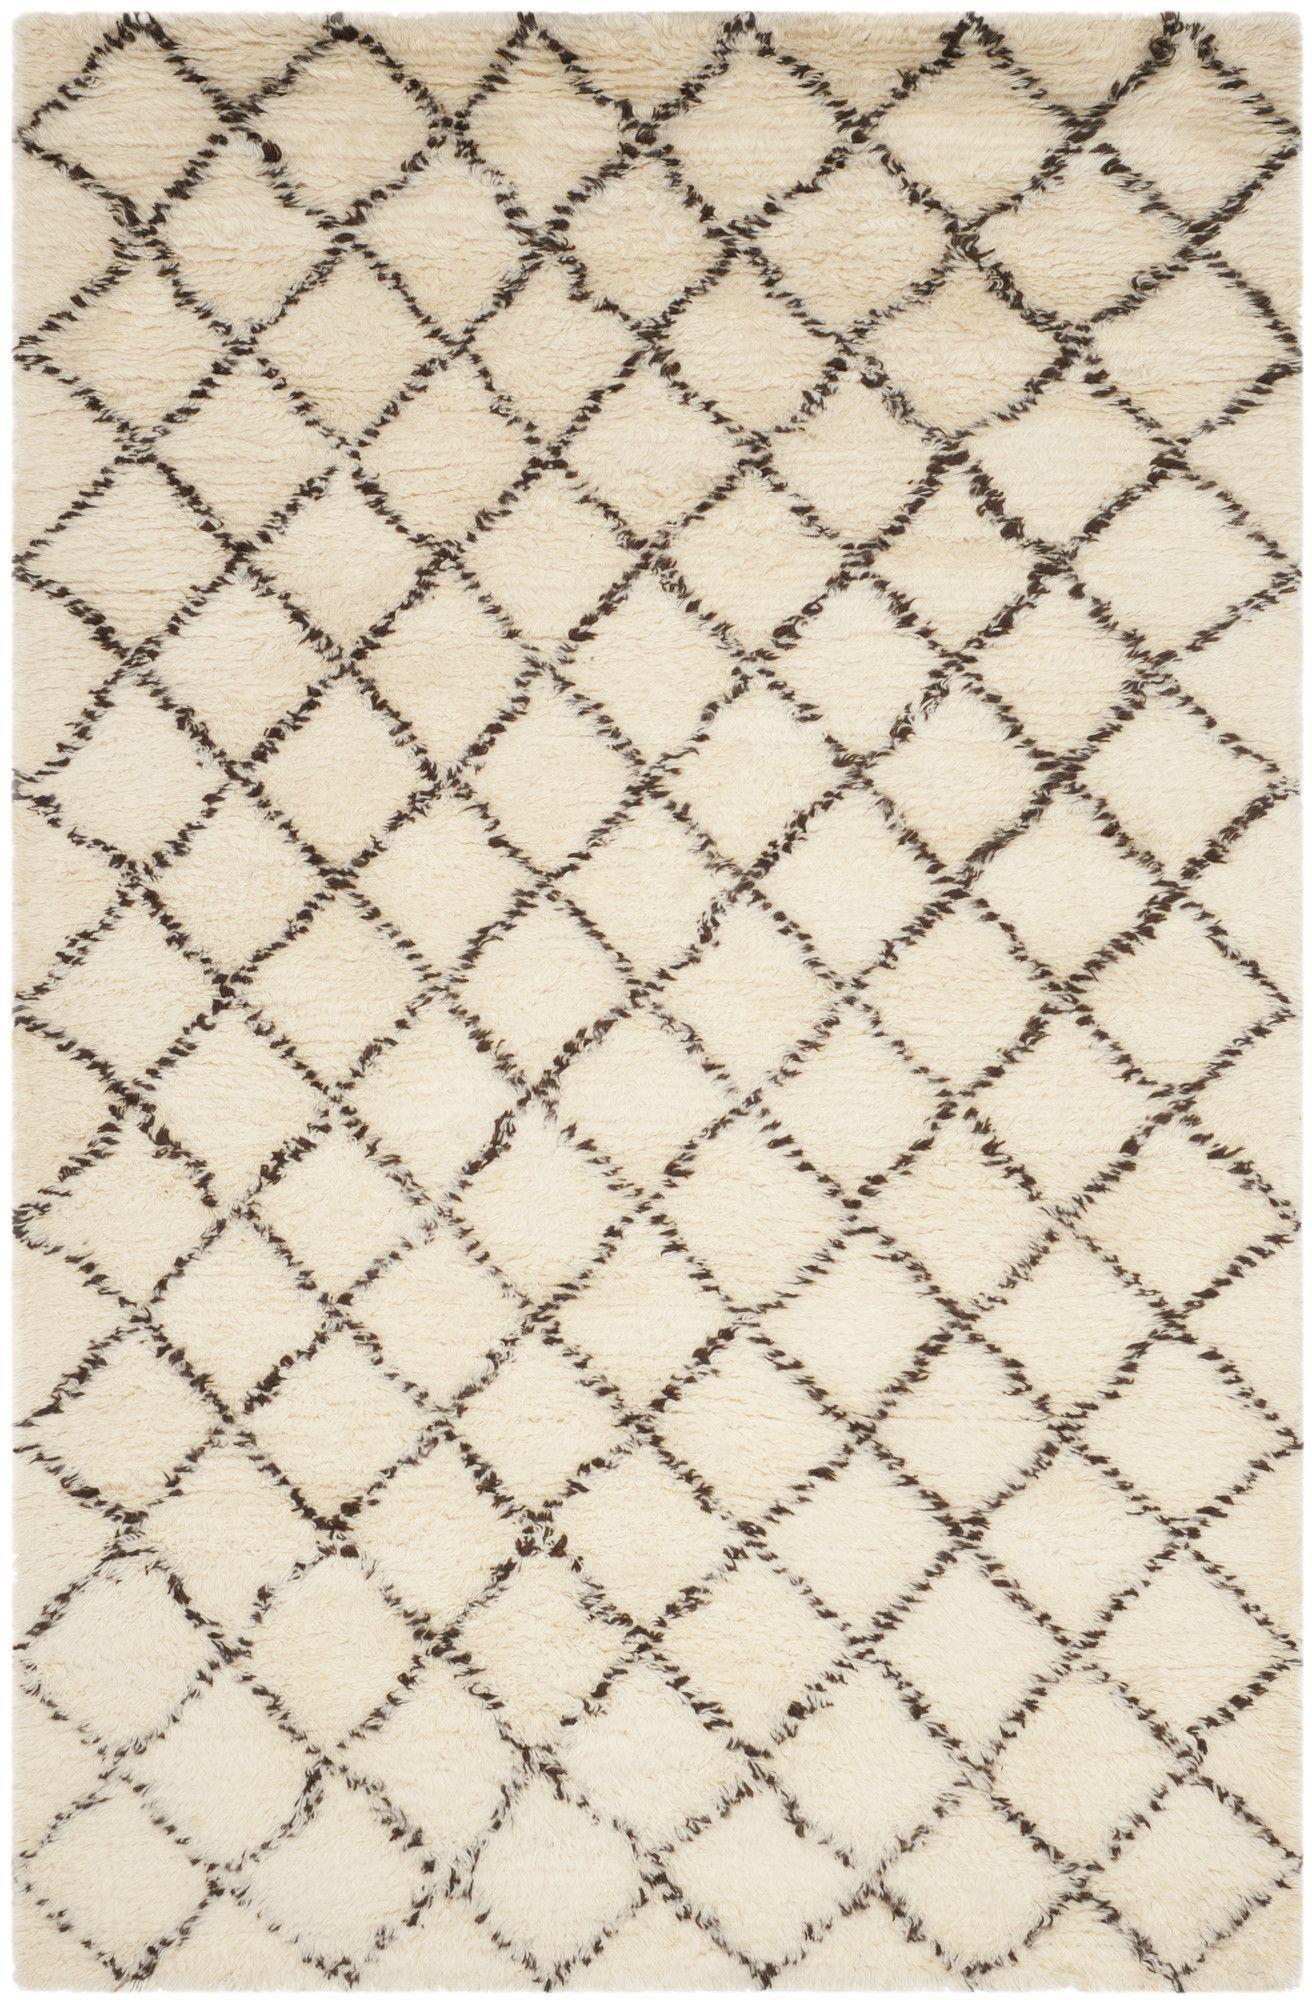 Lohan Hand-Woven Ivory/Dark Brown Area Rug